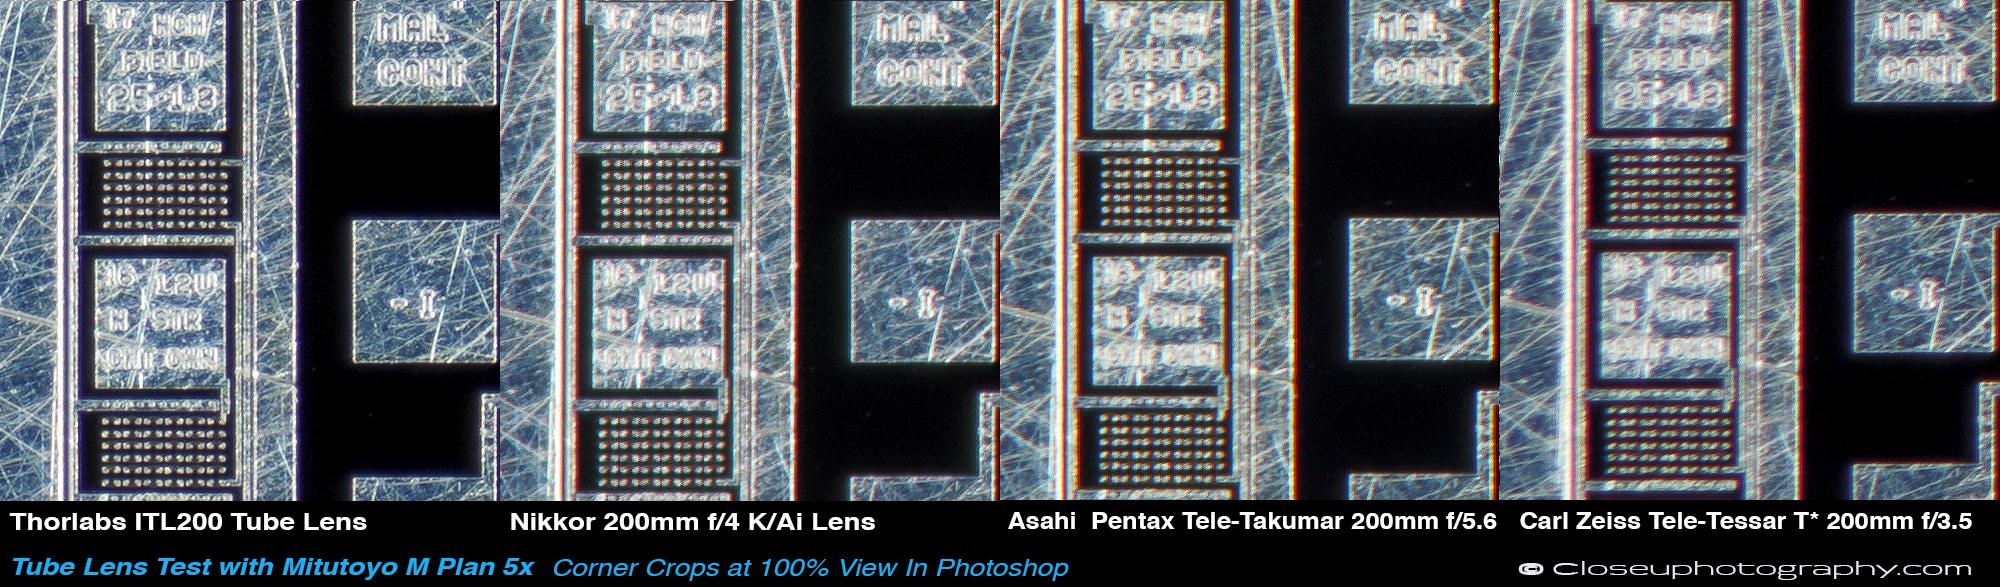 Tube-lens-test-corner-crop-with-Mitutoyo-M-Plan-5x-Closeuphotography.jpg